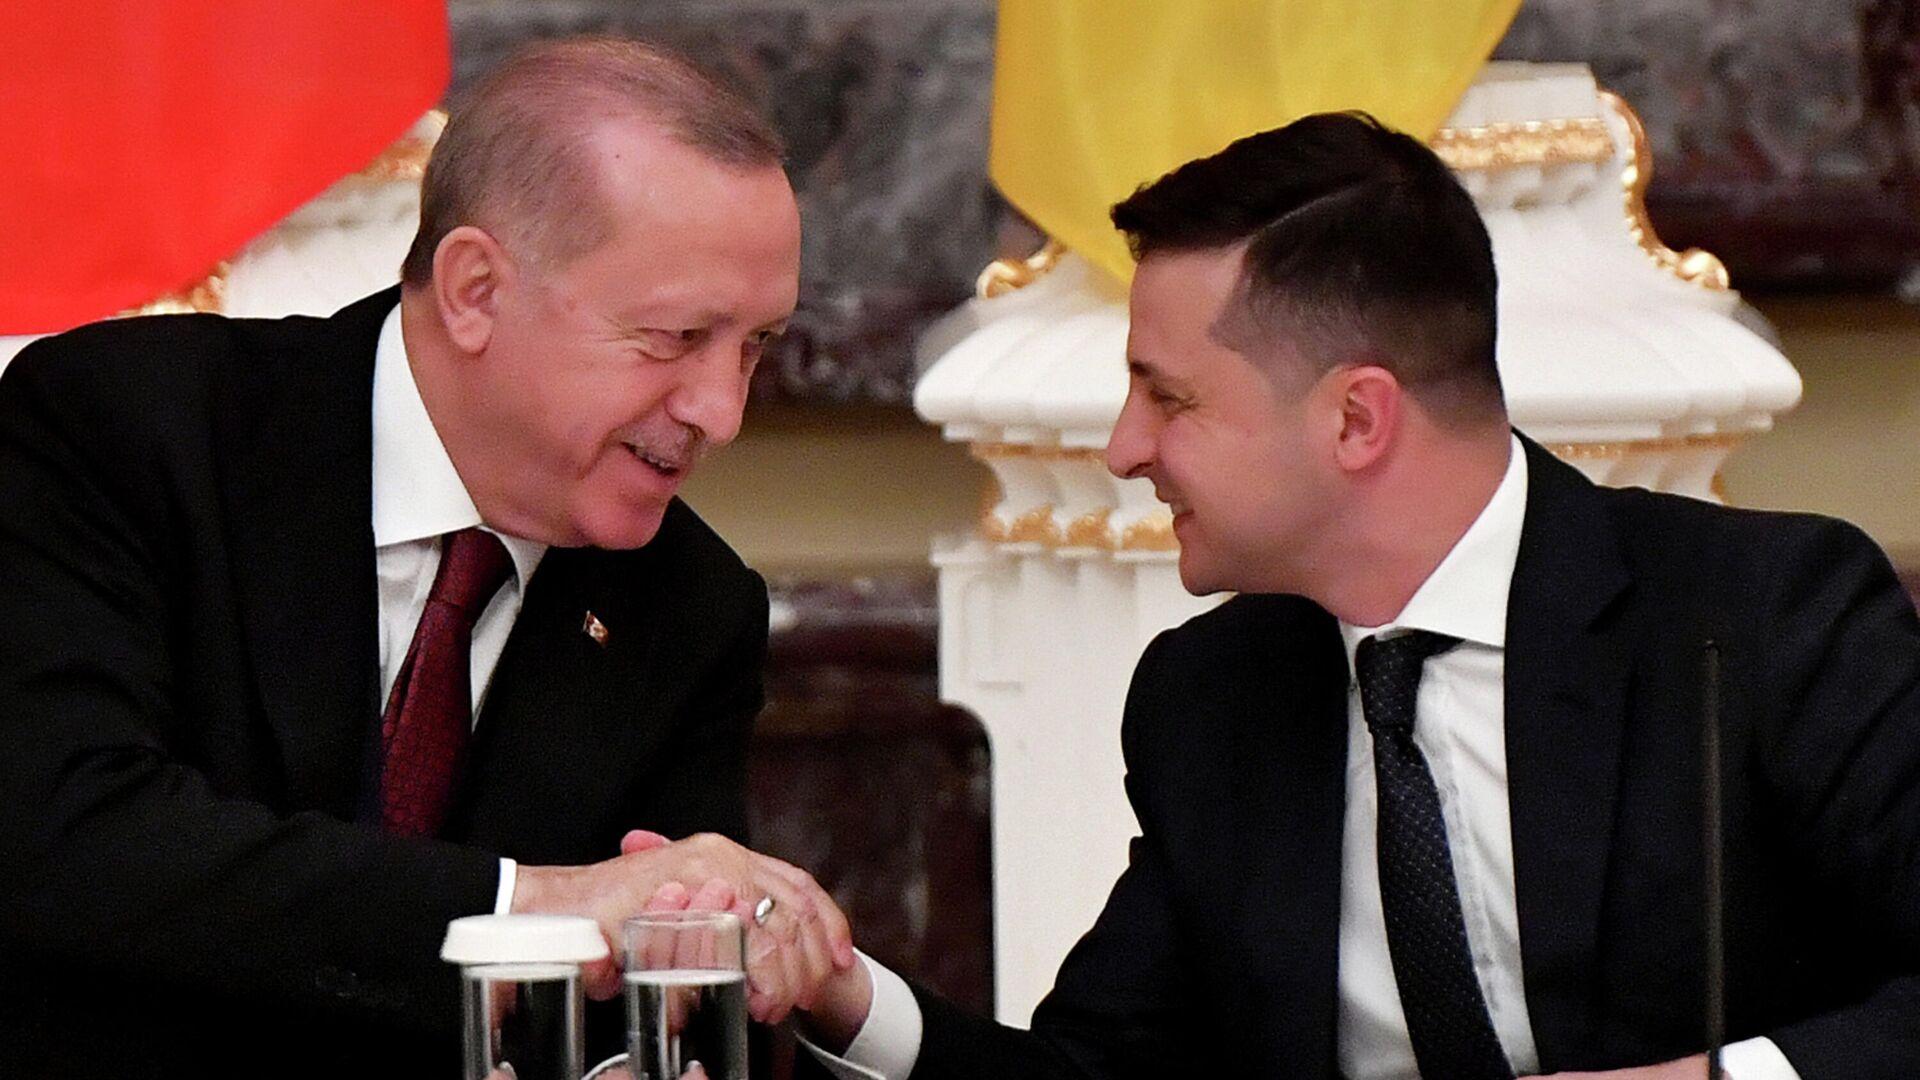 Volodymyr Zelensky et Recep Tayyip Erdogan - Sputnik France, 1920, 22.09.2021